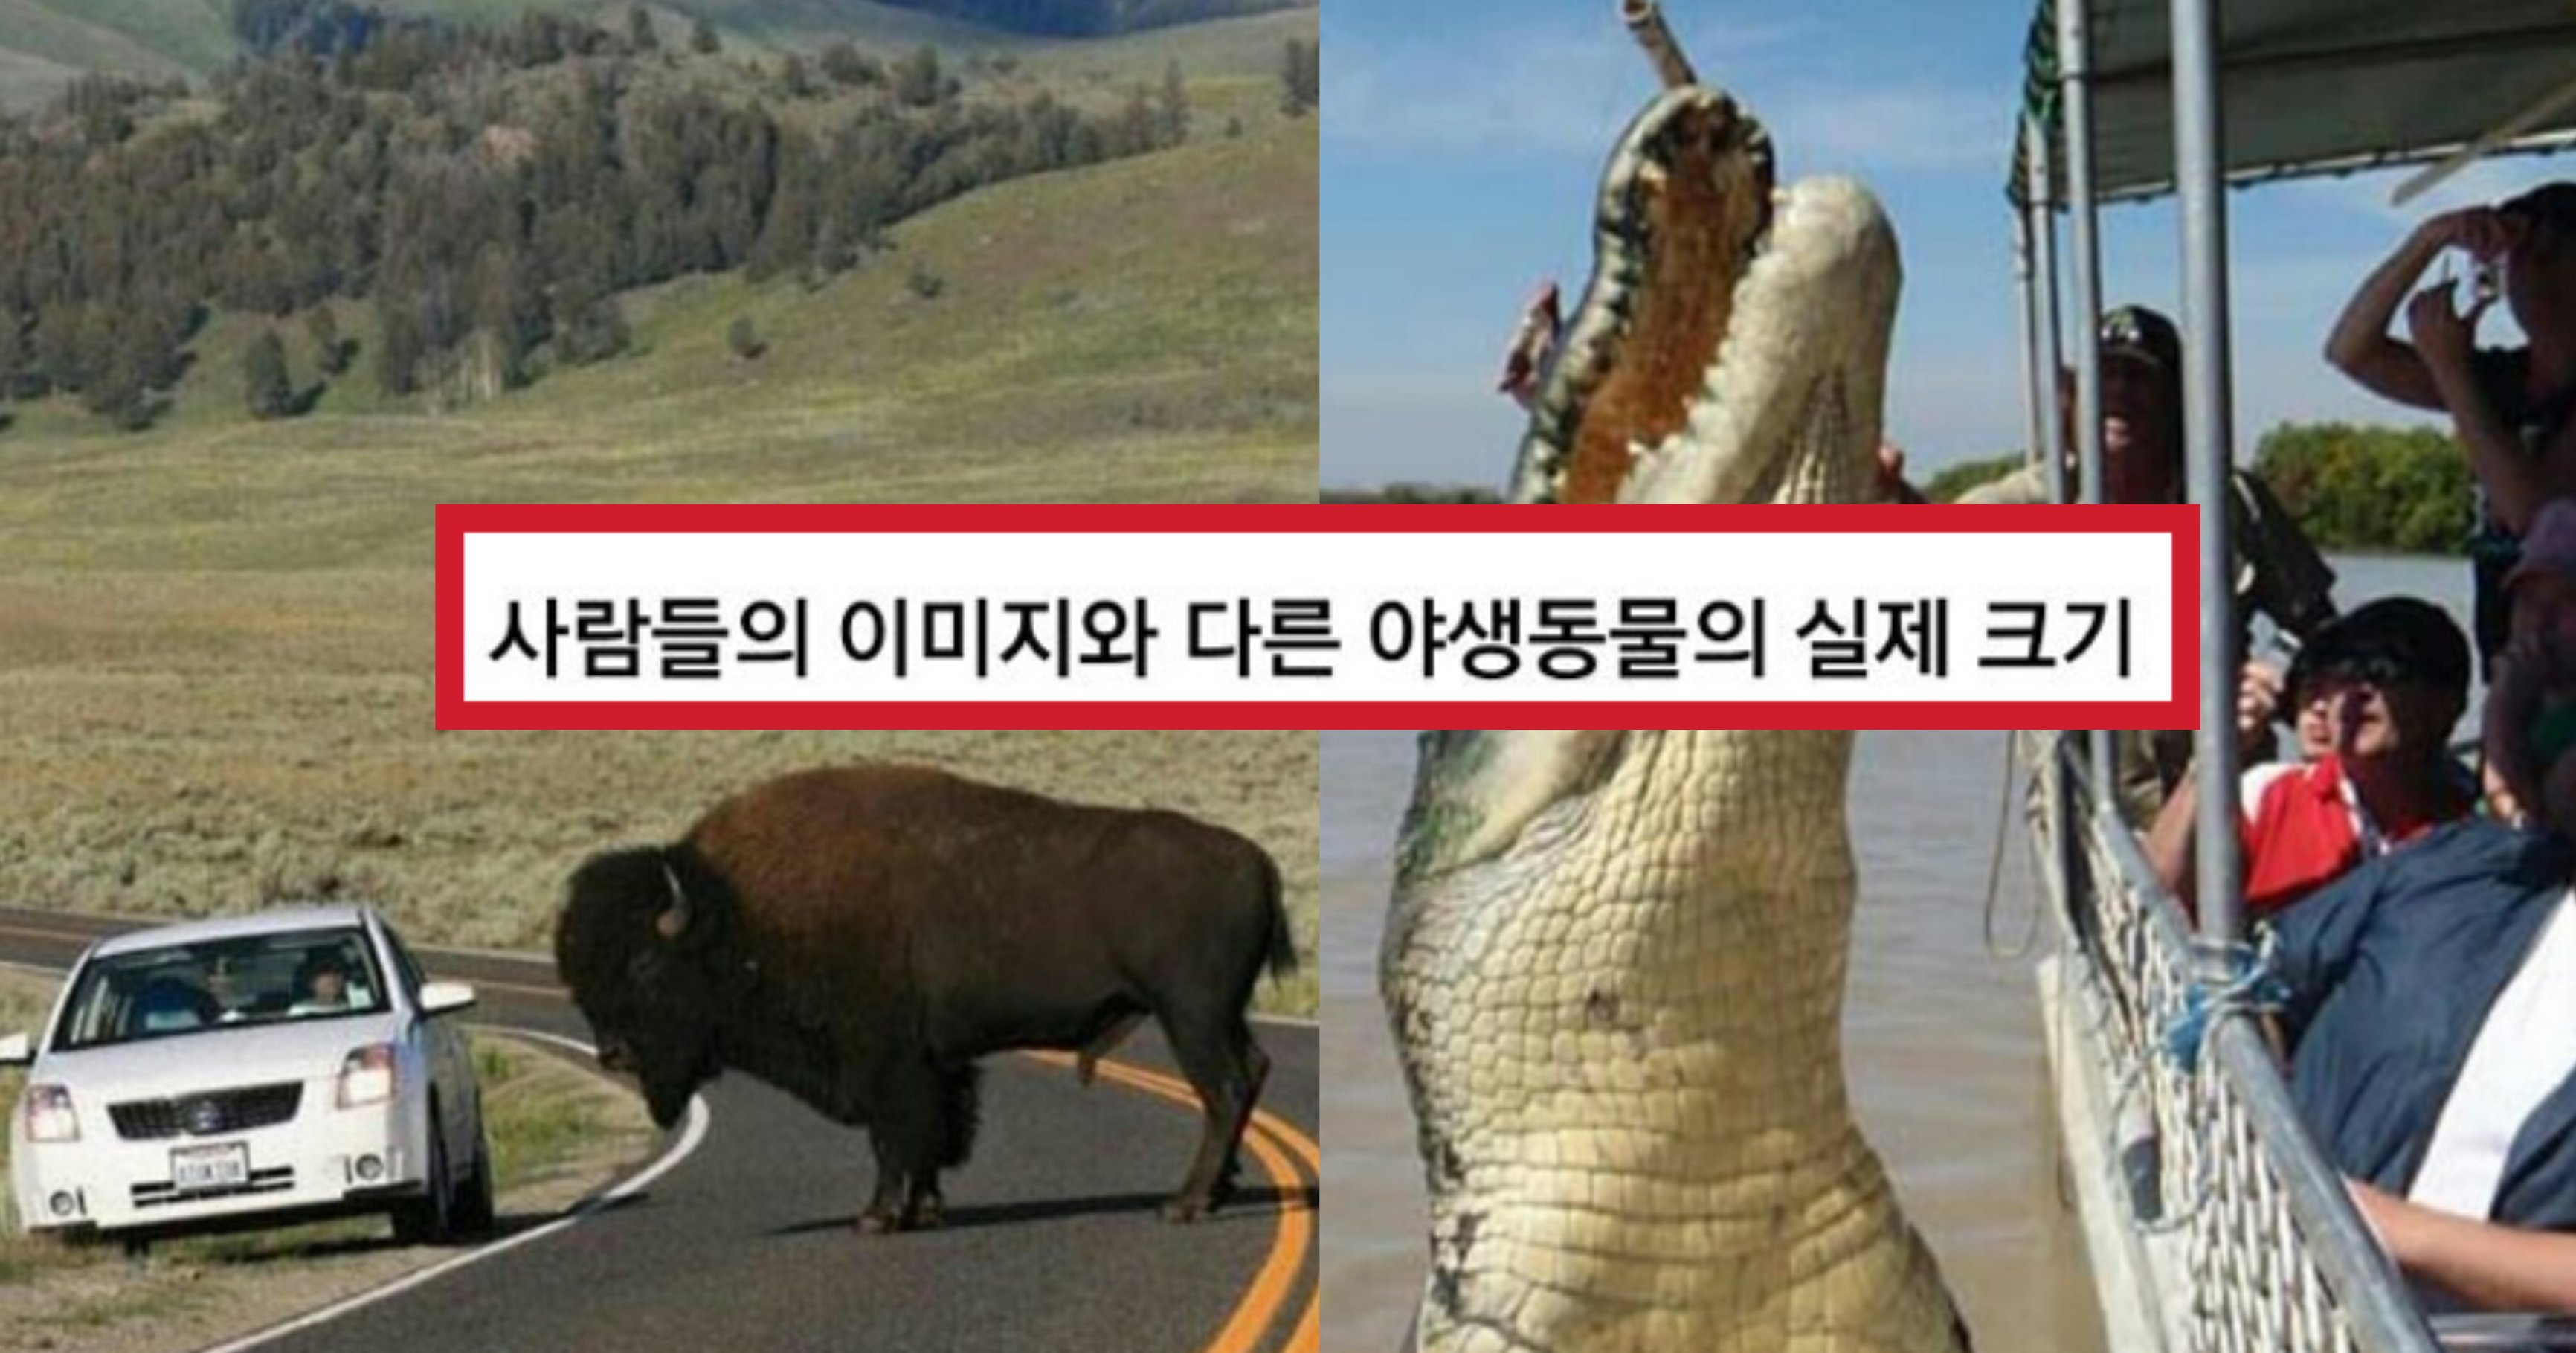 img ce49917faa47 1.jpeg?resize=1200,630 - 사람들이 생각하는 이미지랑 '갭차이' 오지는 야생동물들 실제 크기 수준(+사진)